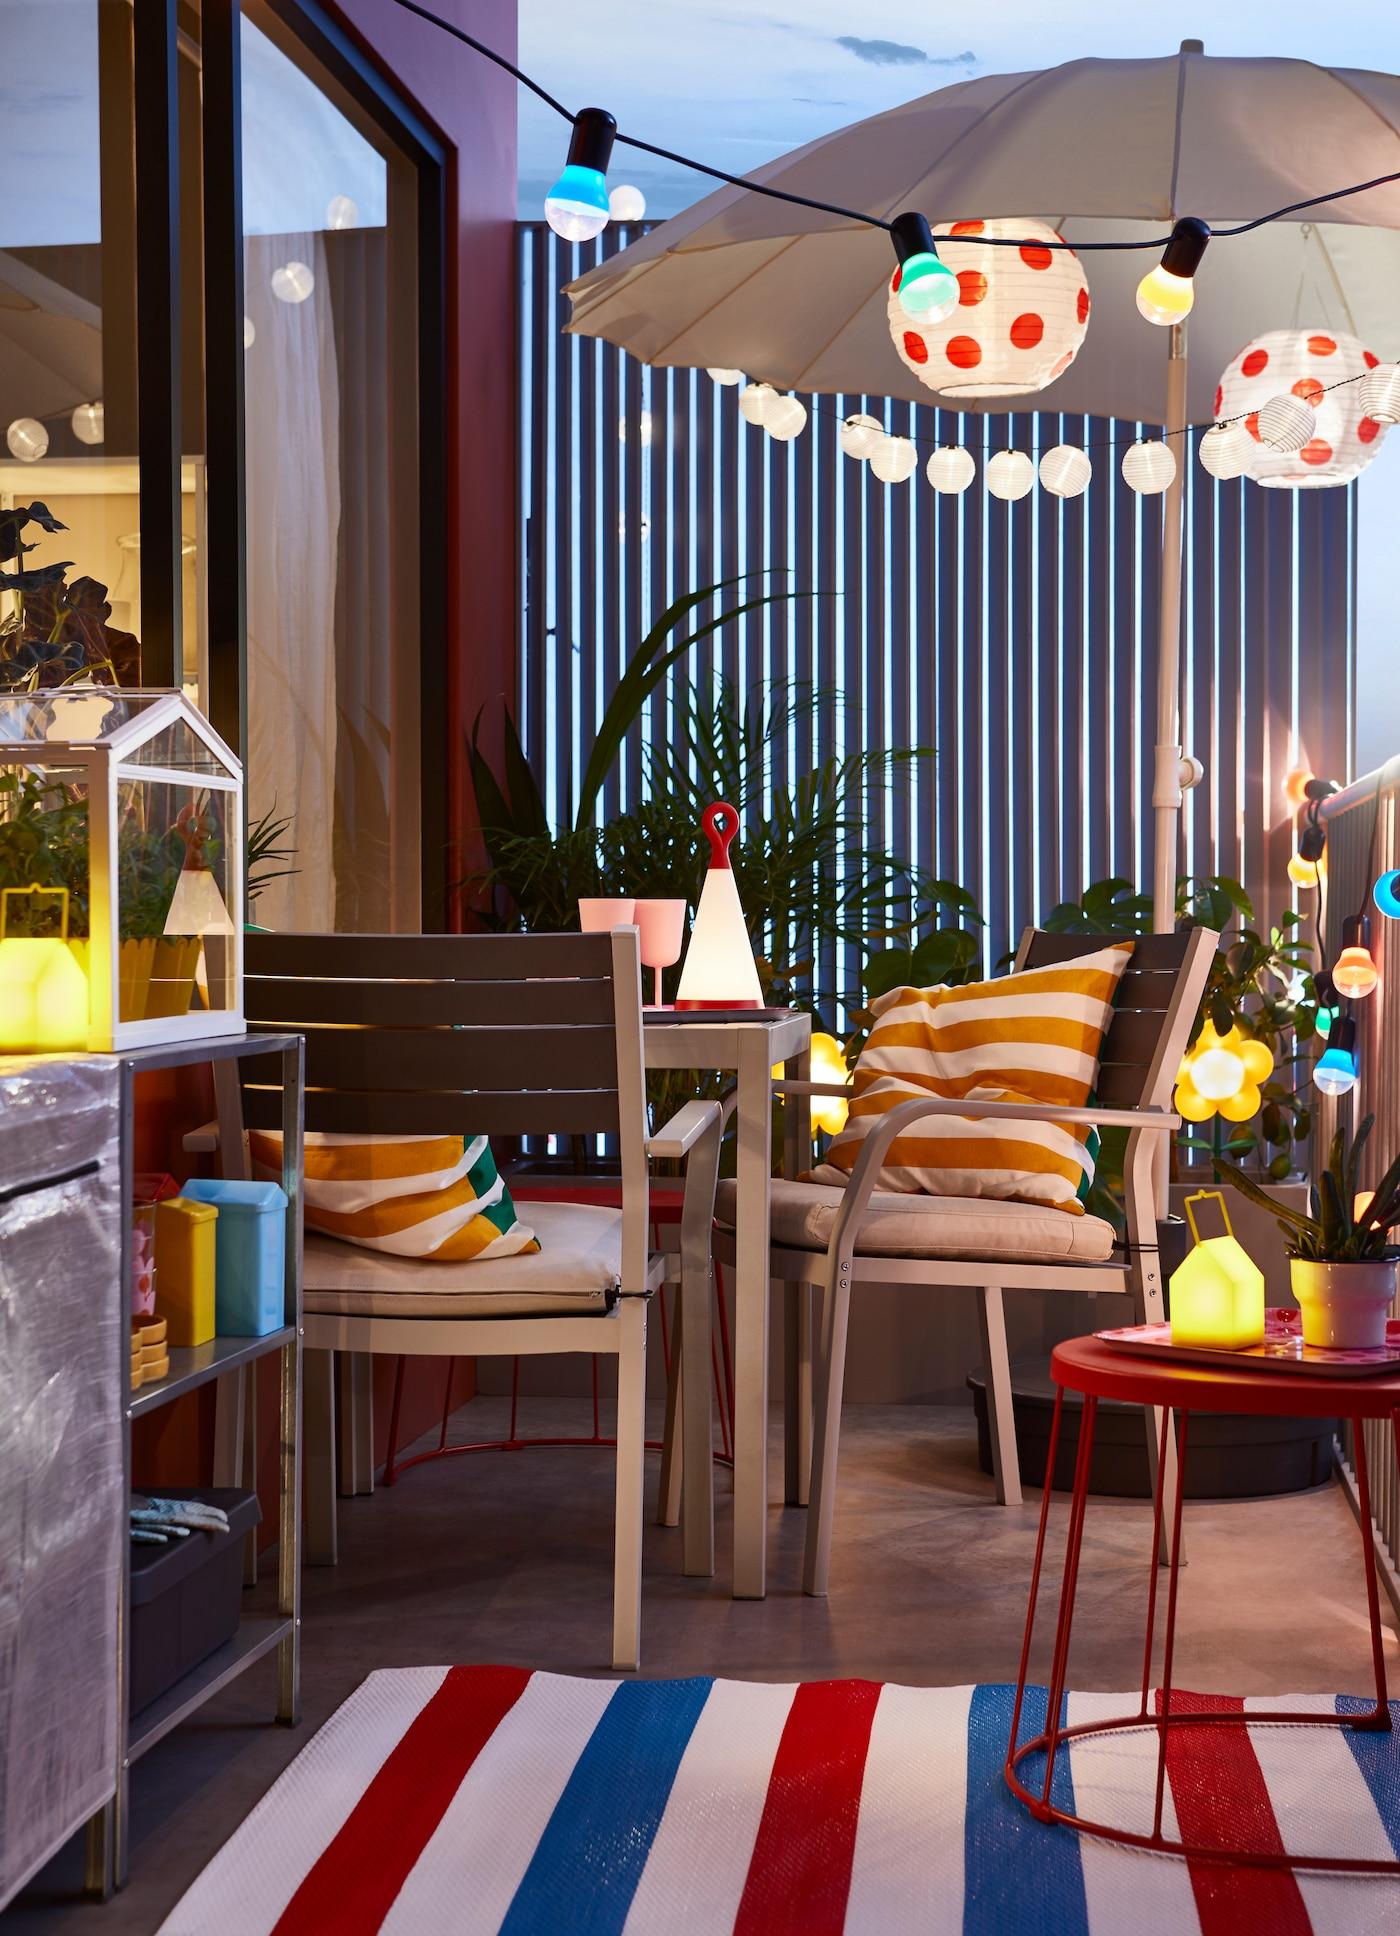 Balcón Una Un Colorido Personalidad Vibrante Ikea Para 8kwOXn0P